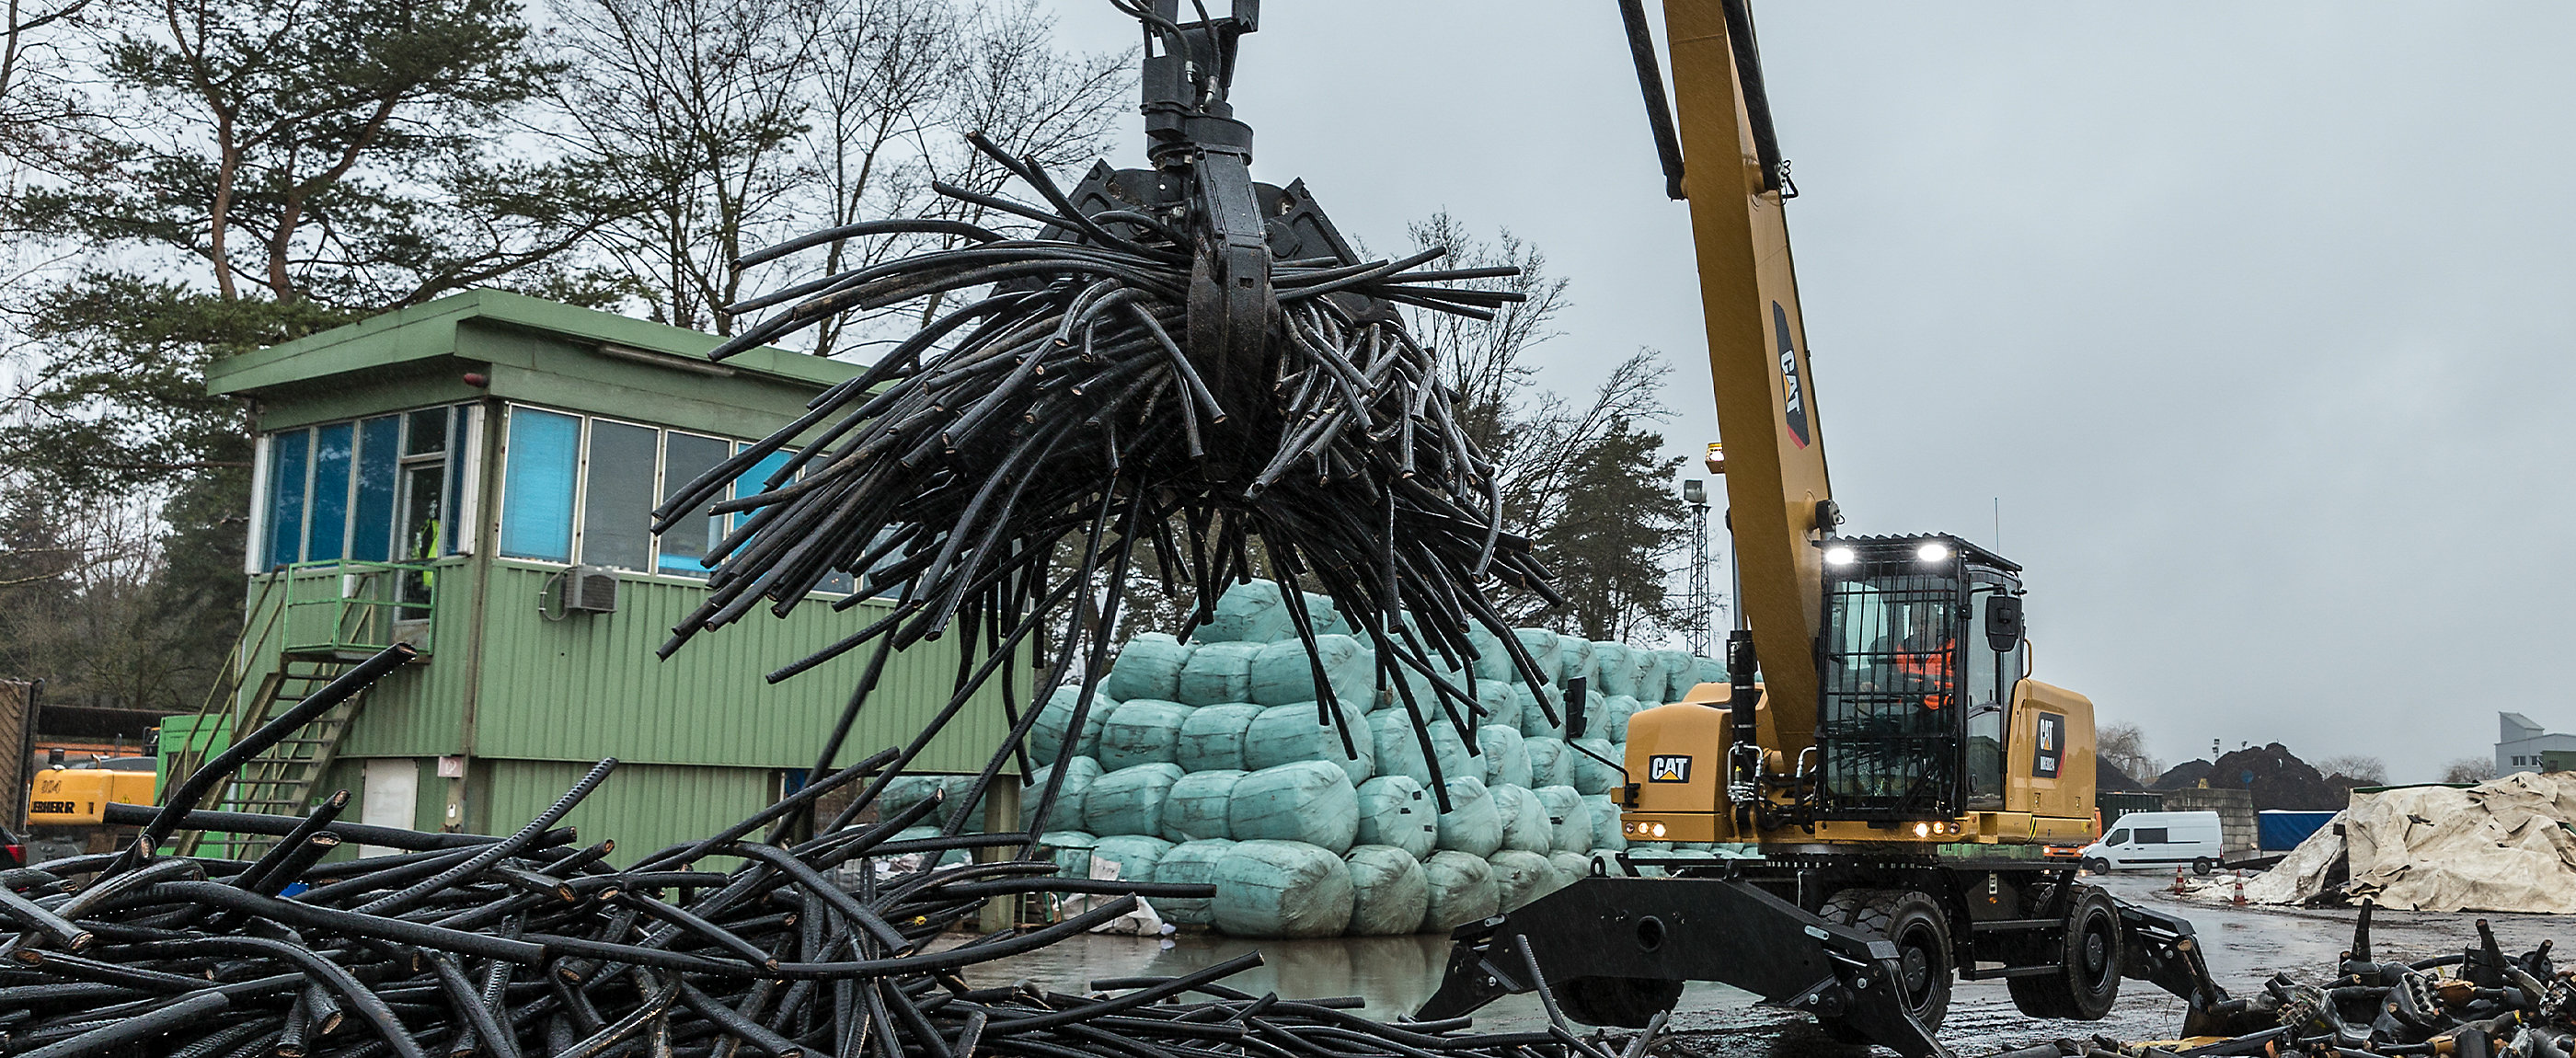 Scrap Recycling Attachments